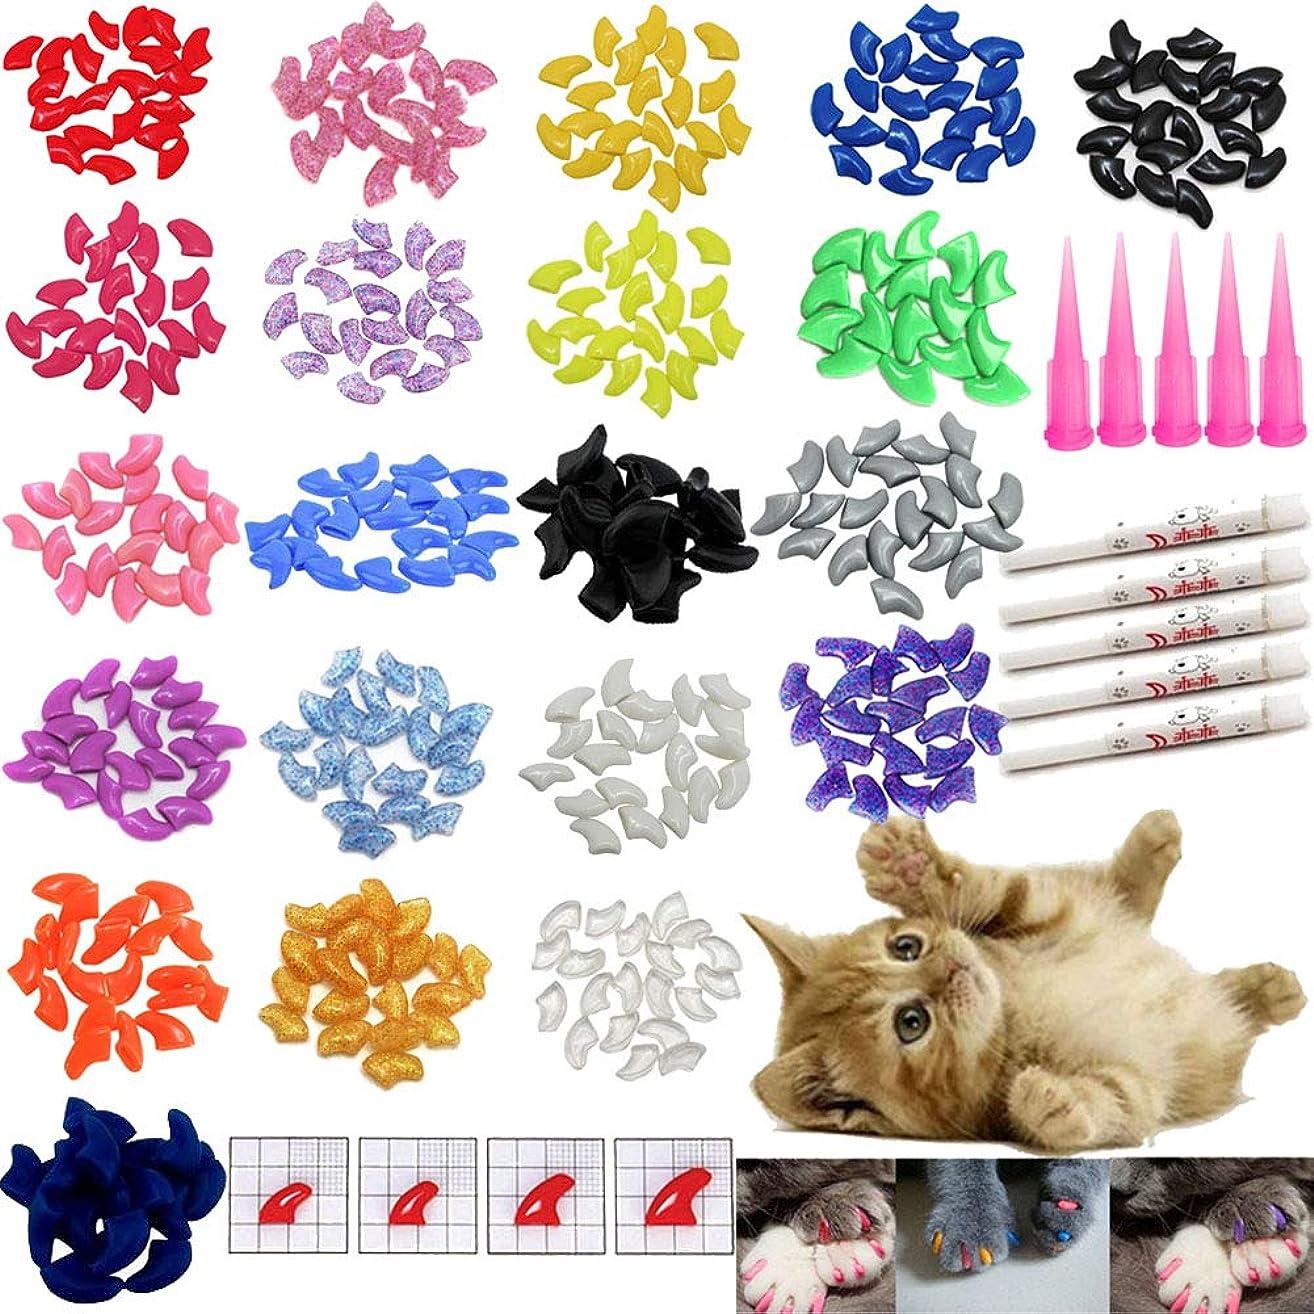 VICTHY 100 PCS Soft Pet Cat Nail Caps Cats Paws Grooming Nail Claws Caps Covers of 5 Kinds 5Pcs Adhesive Glue